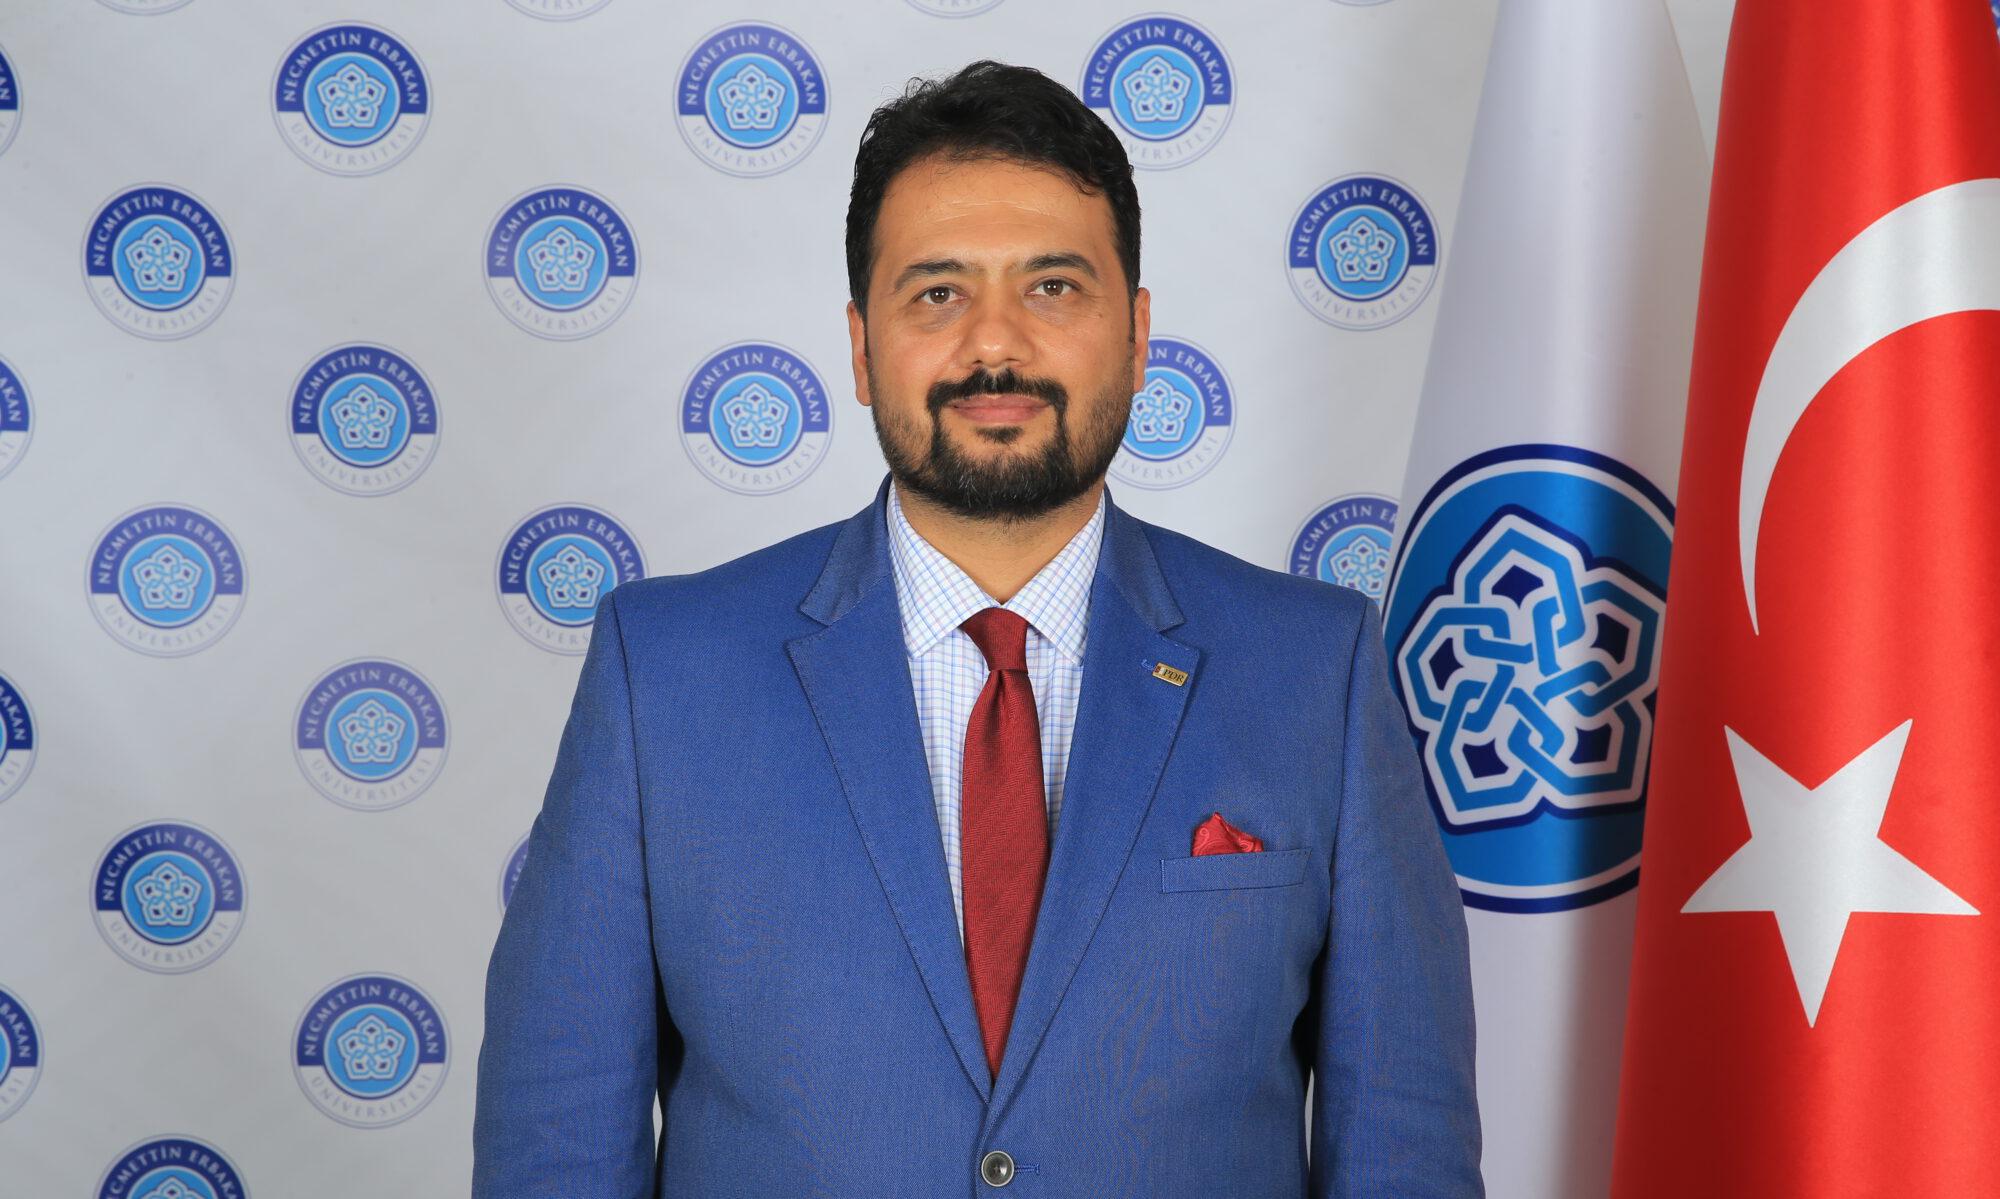 Prof. Dr. Erdal HAMARTA